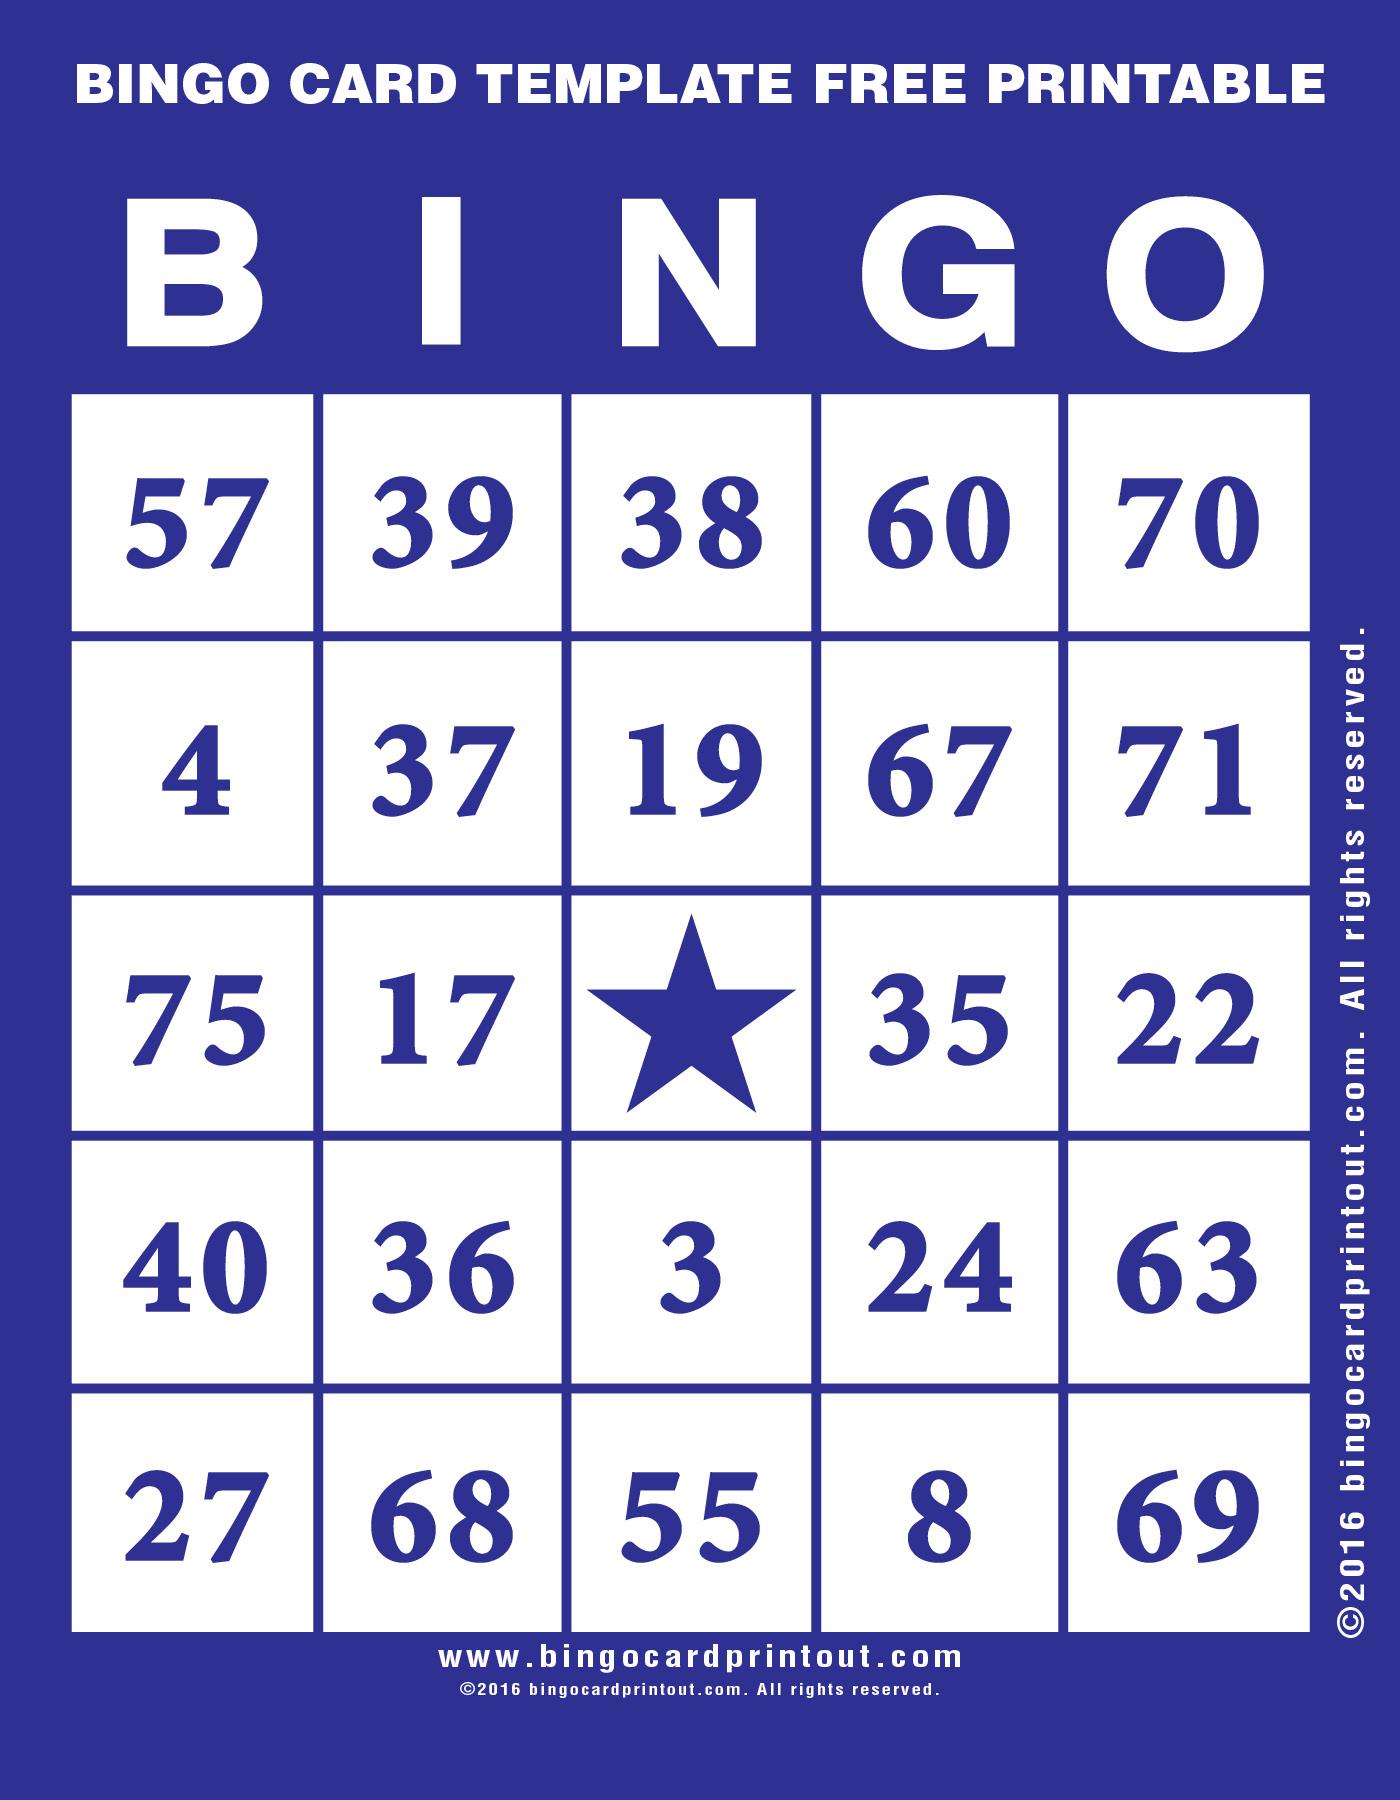 image relating to Free Printable Bingo Cards 1 75 named Bingo Card Template Totally free Printable -